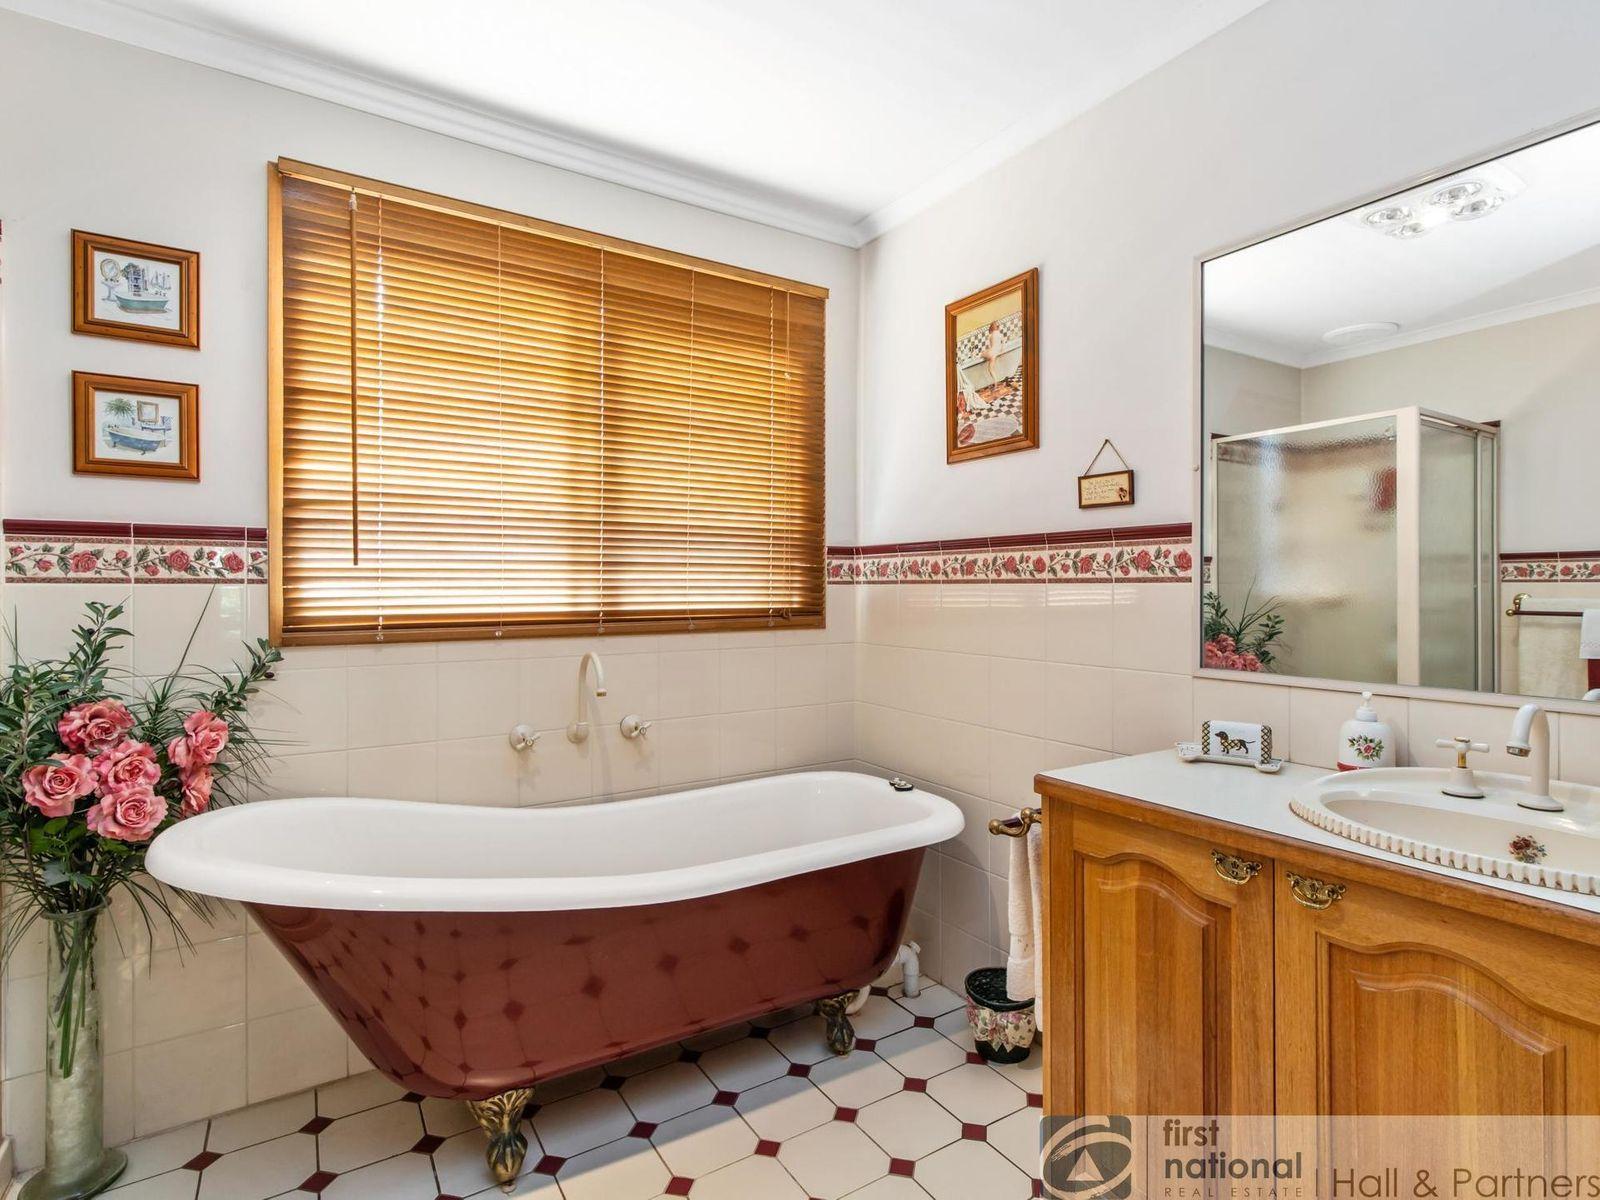 10 Bluebell Court, Berwick, VIC 3806